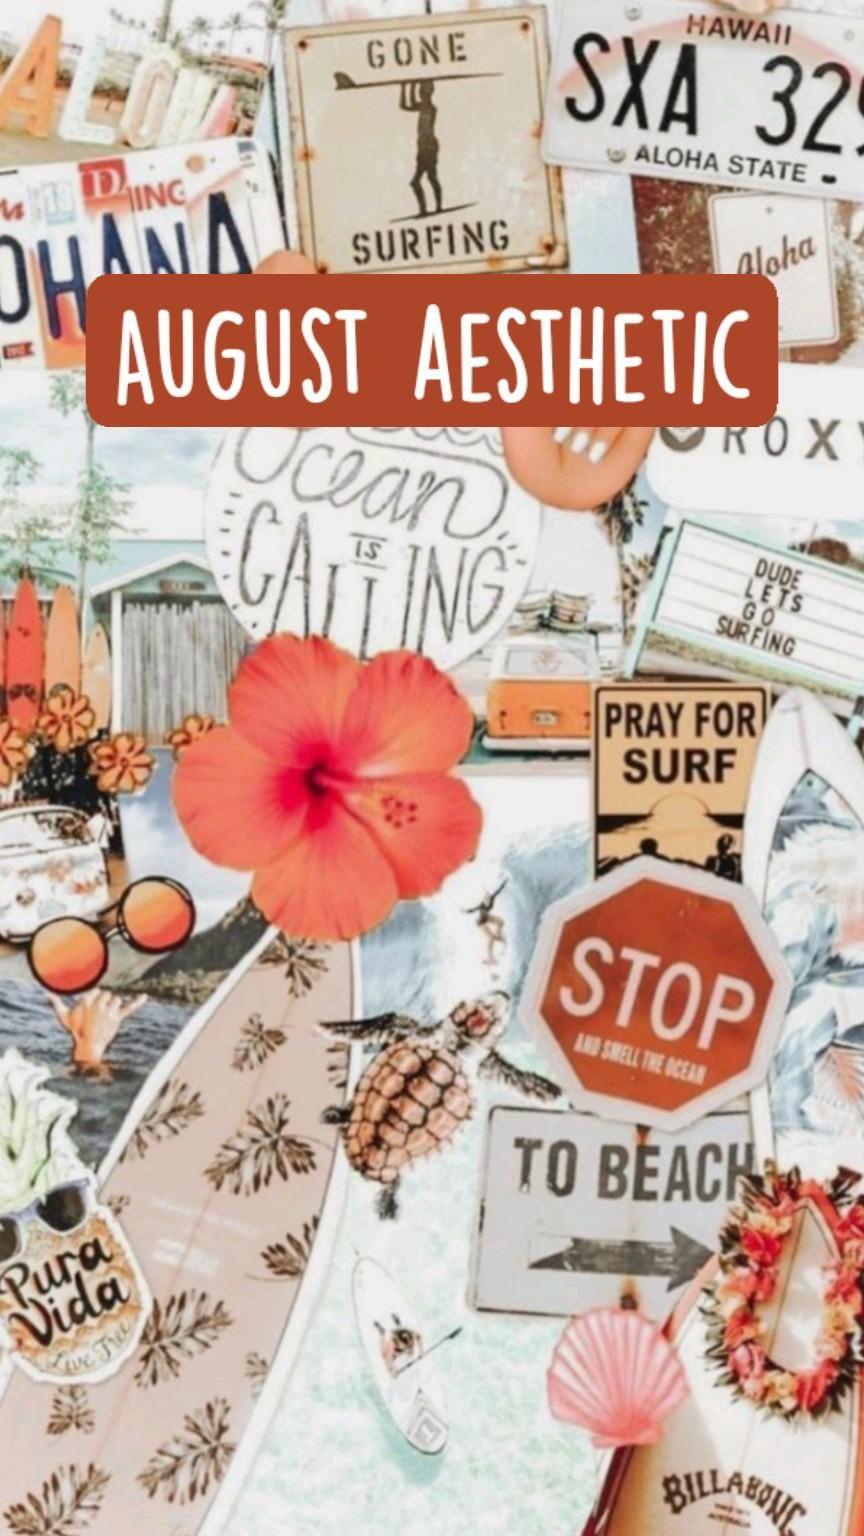 August aesthetic